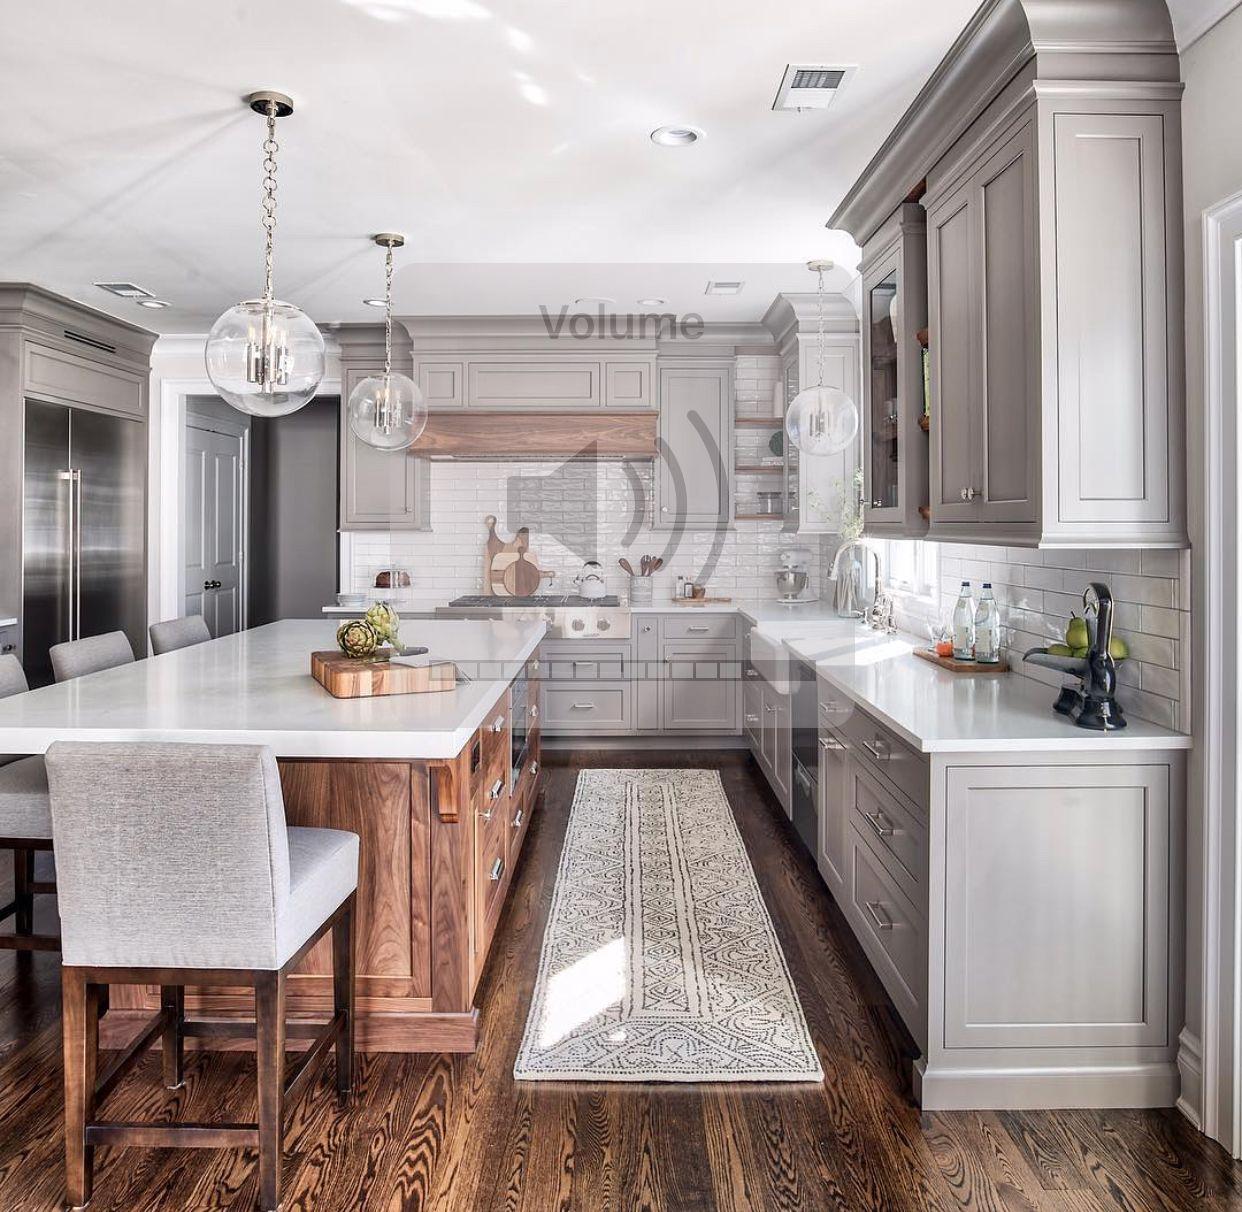 Corner Kitchen With Island: Pin By Cara Brashear On Cabinets